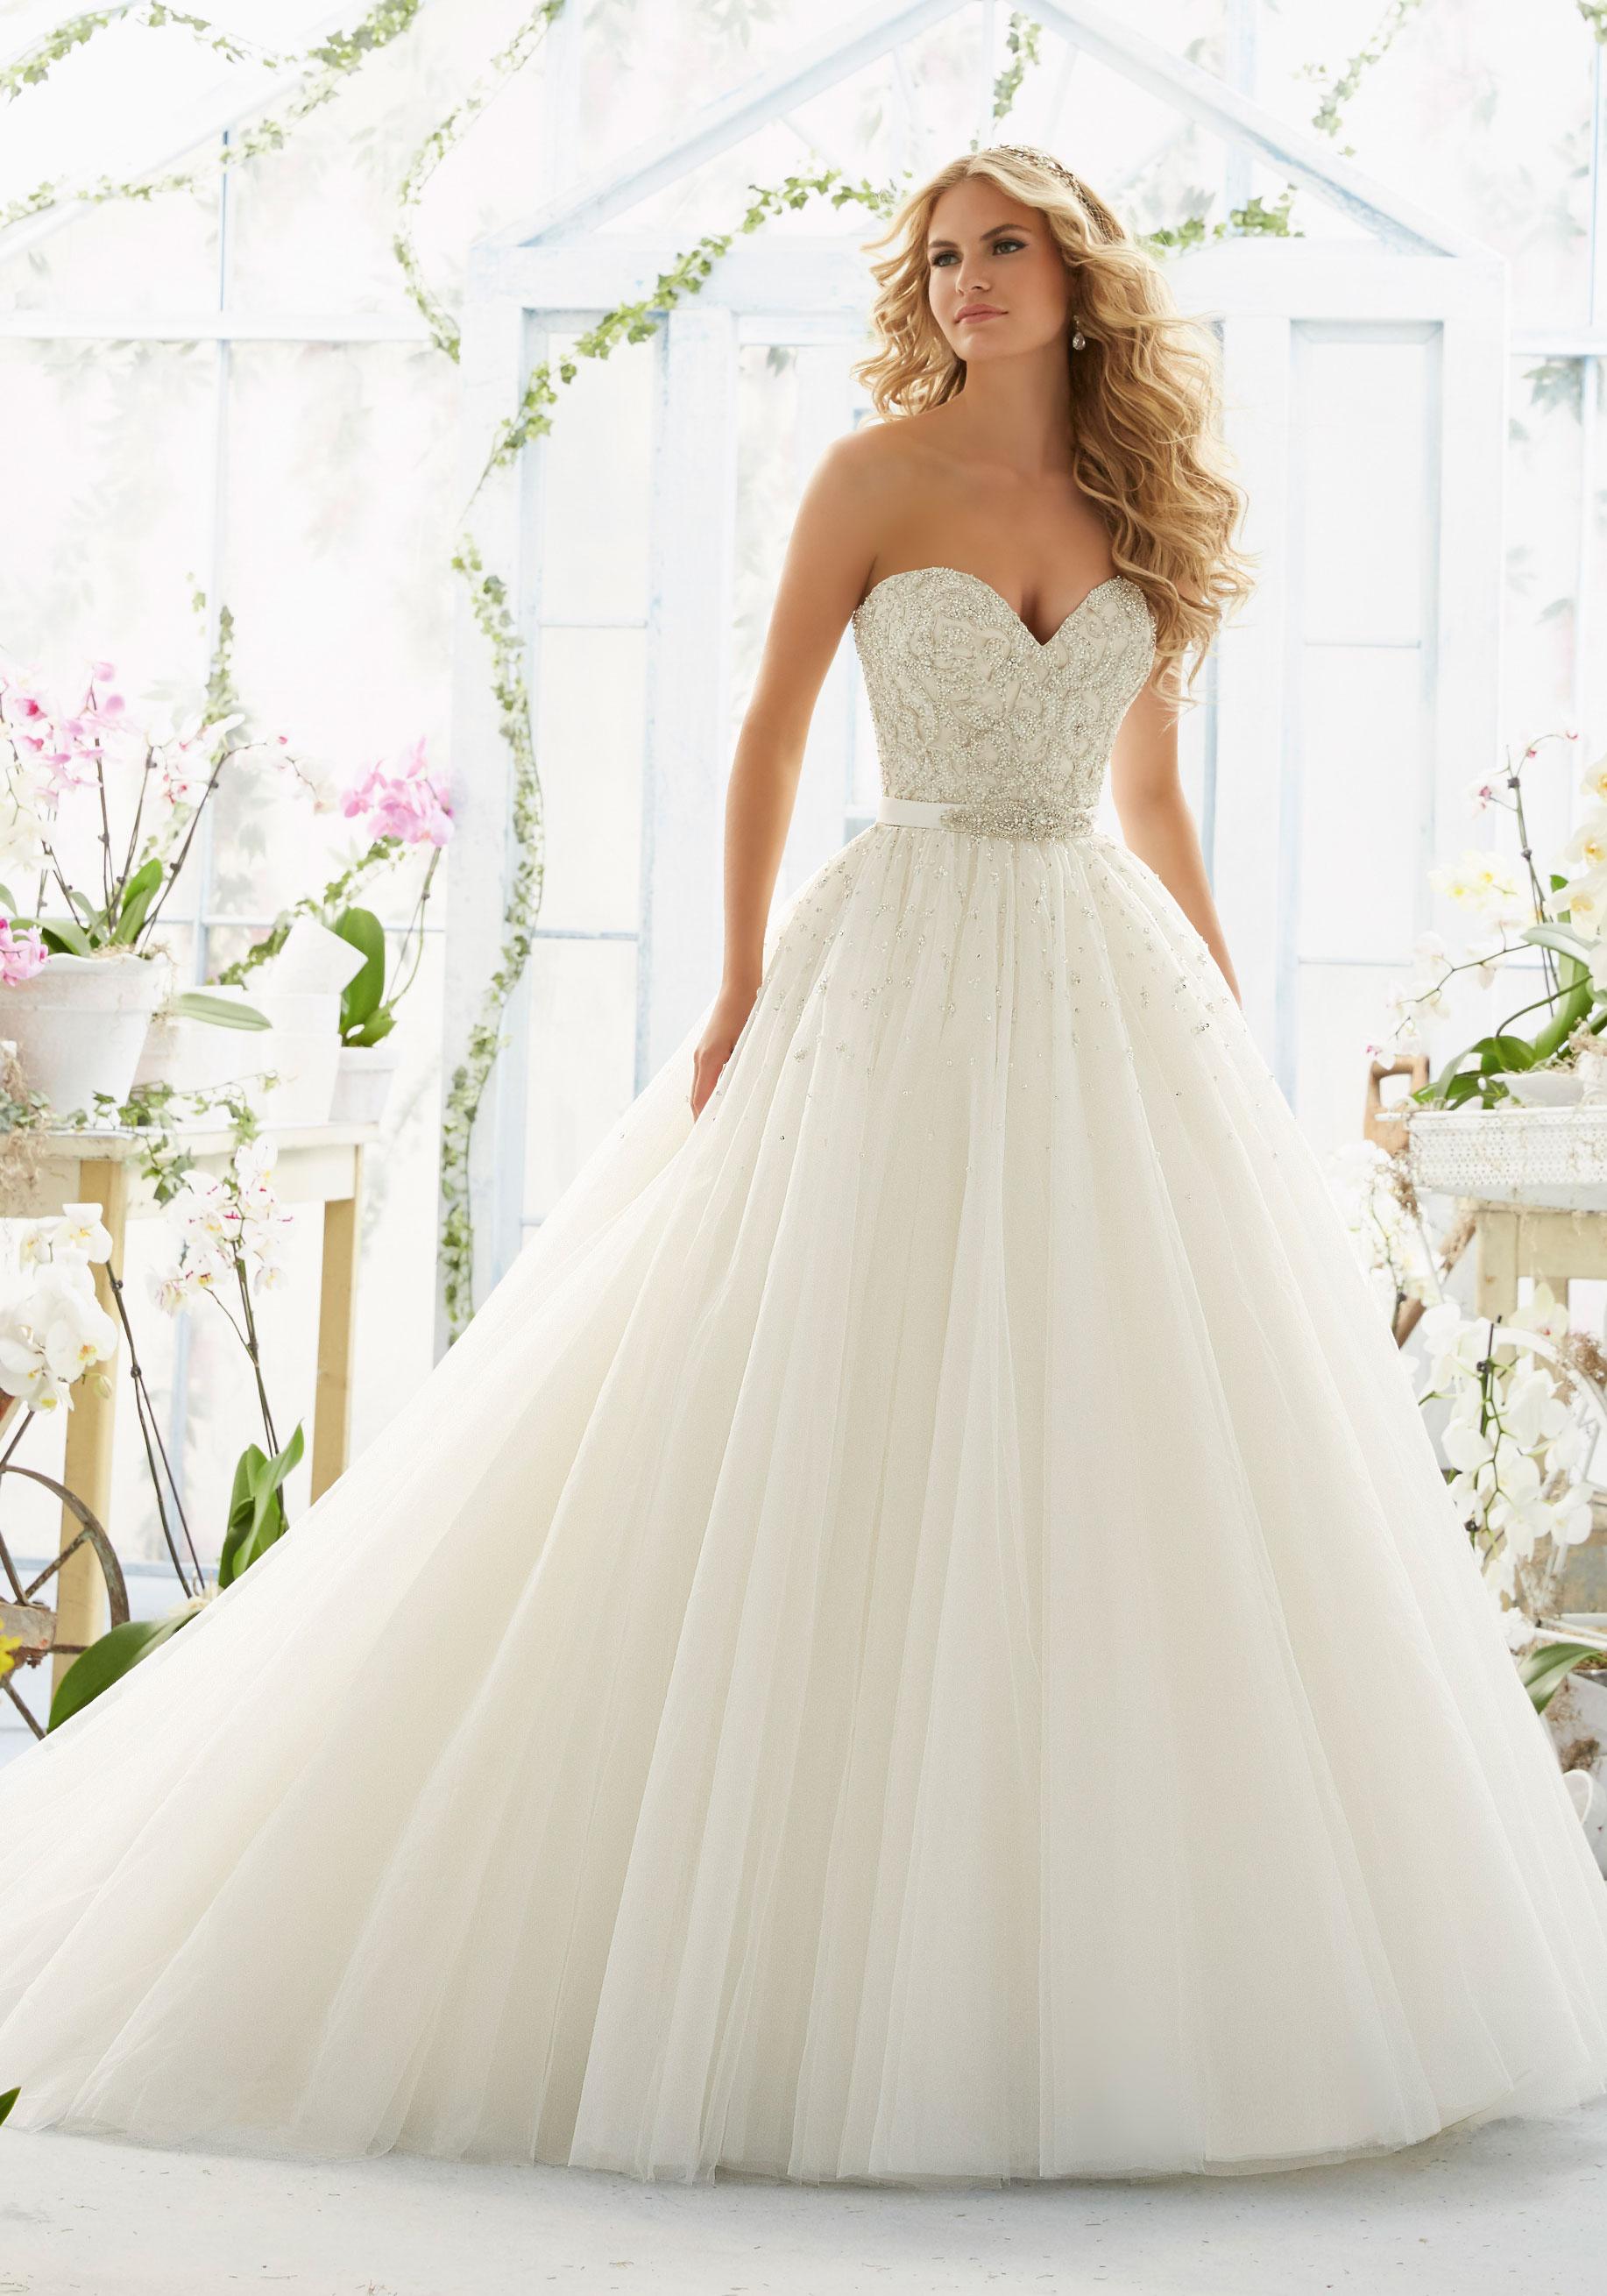 popular wedding dresses 2017 photo - 1